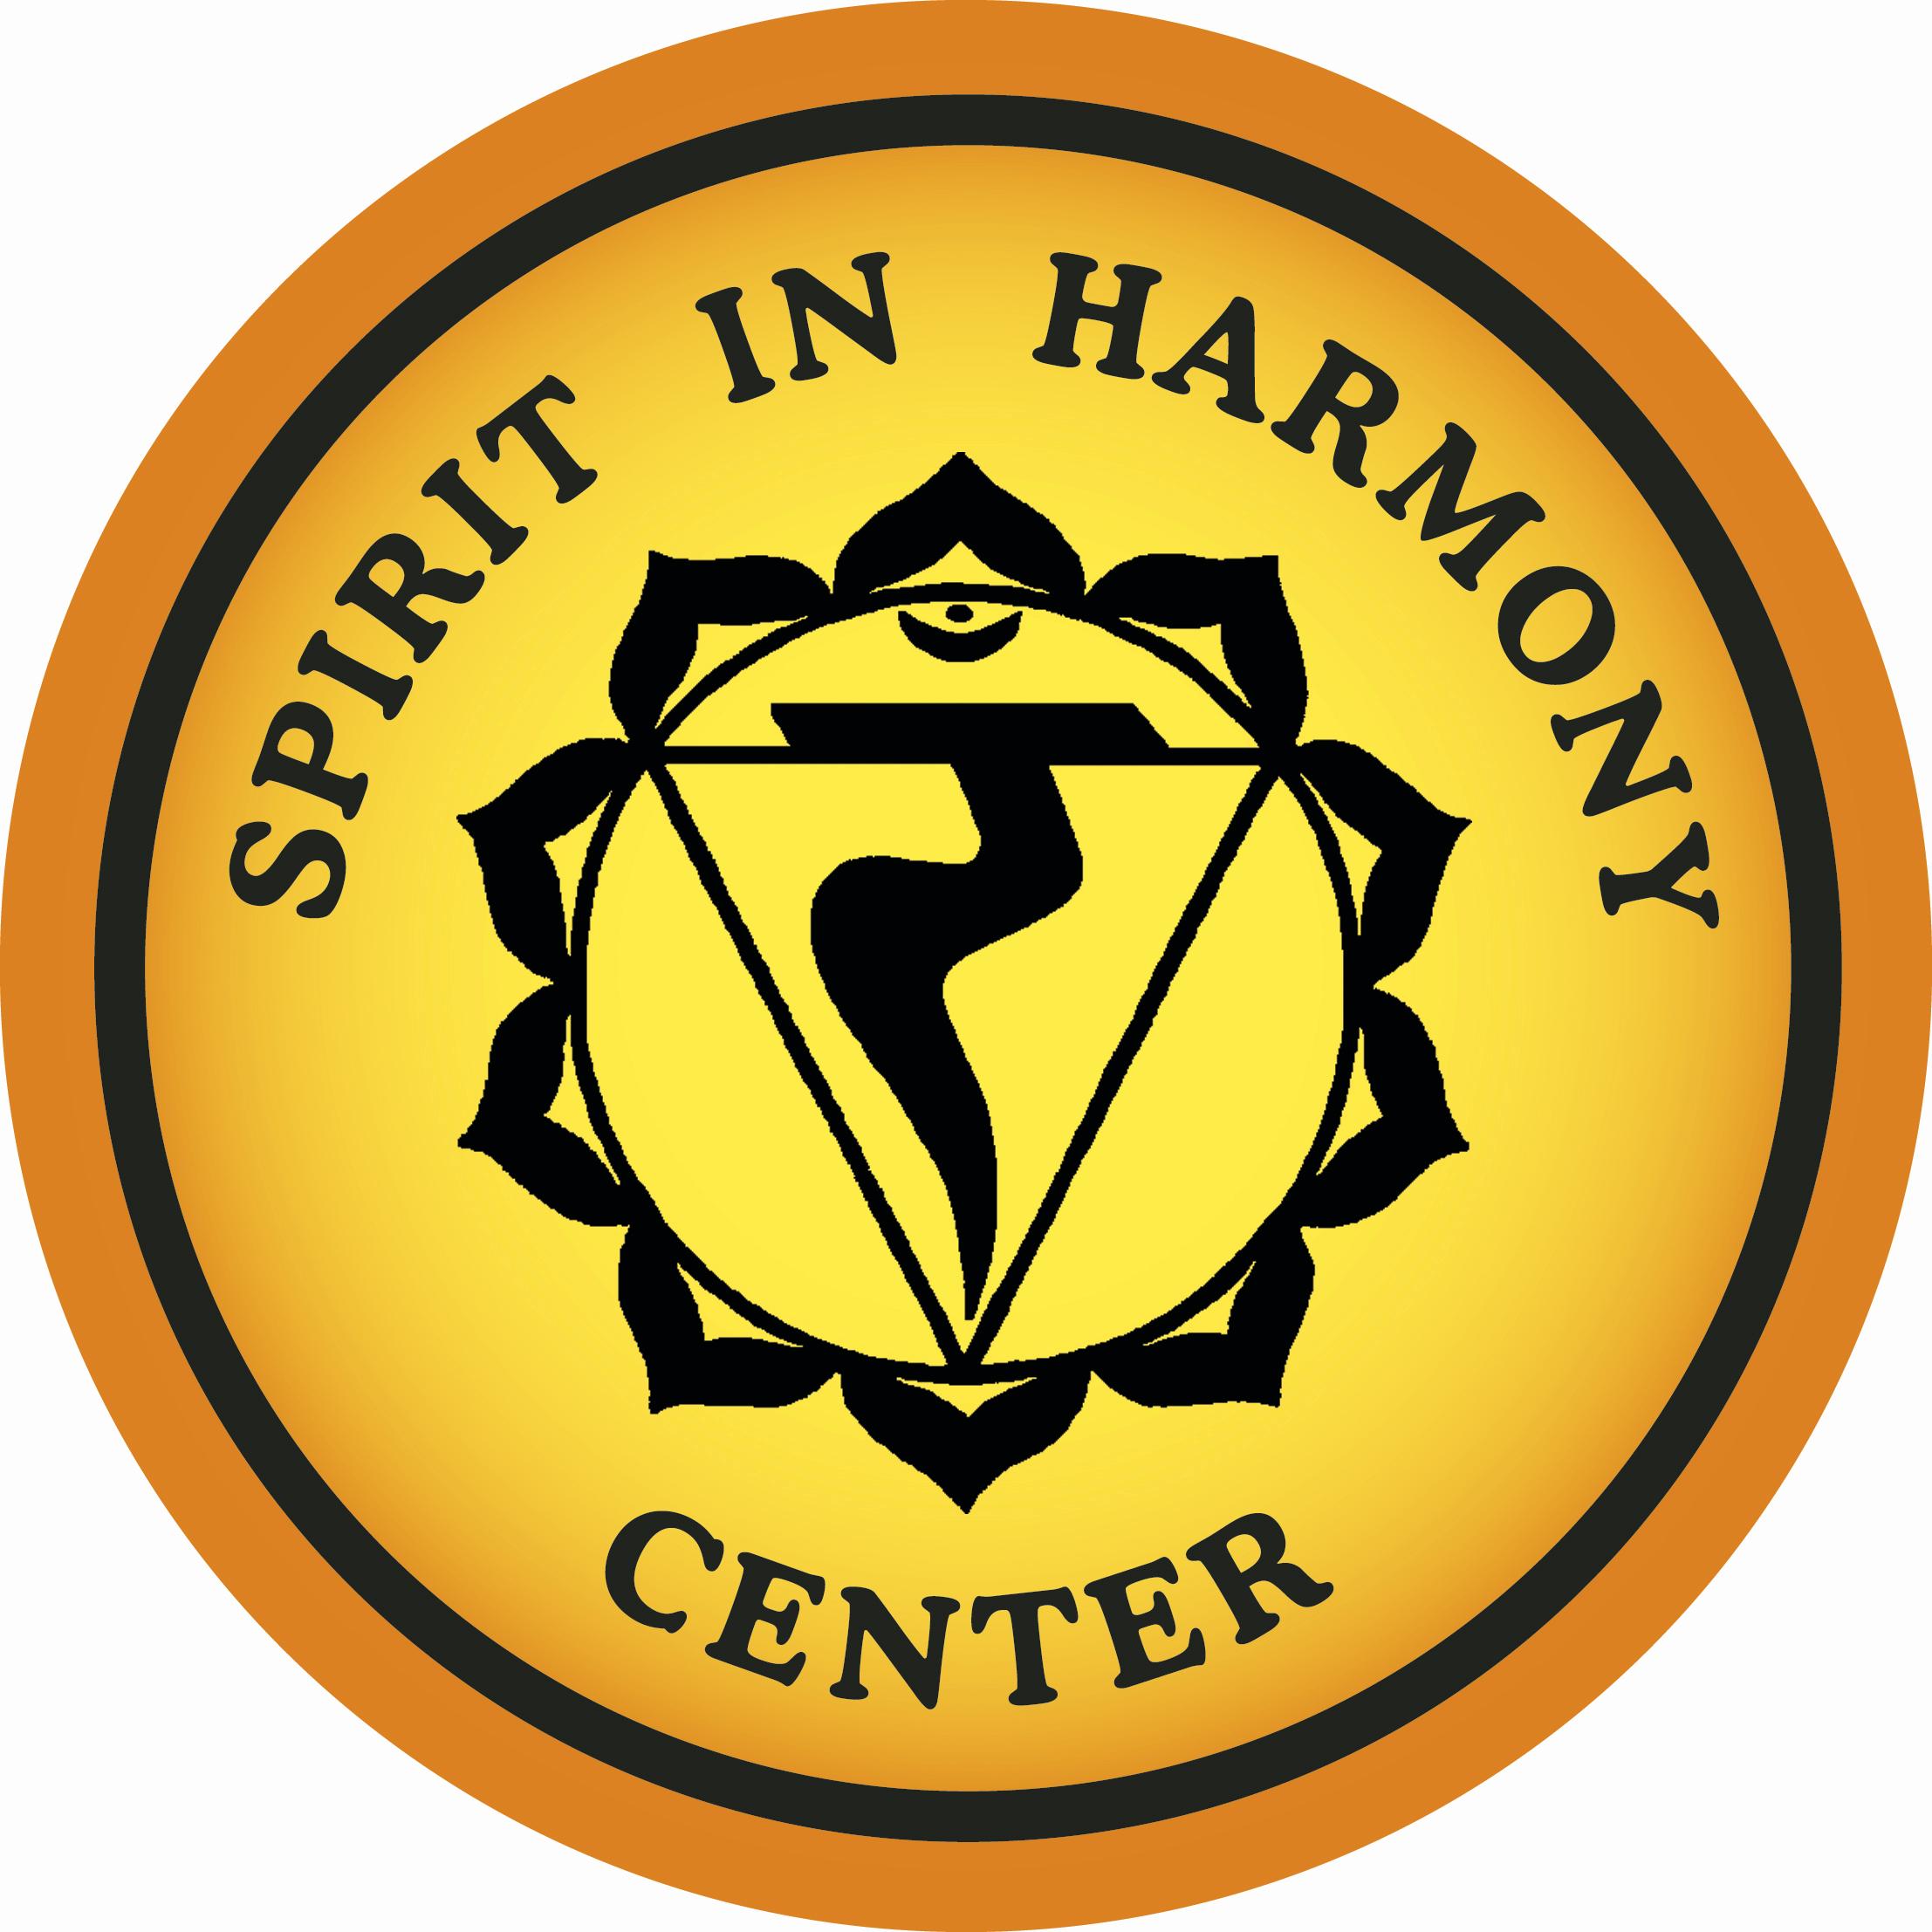 Spirit In Harmony Center